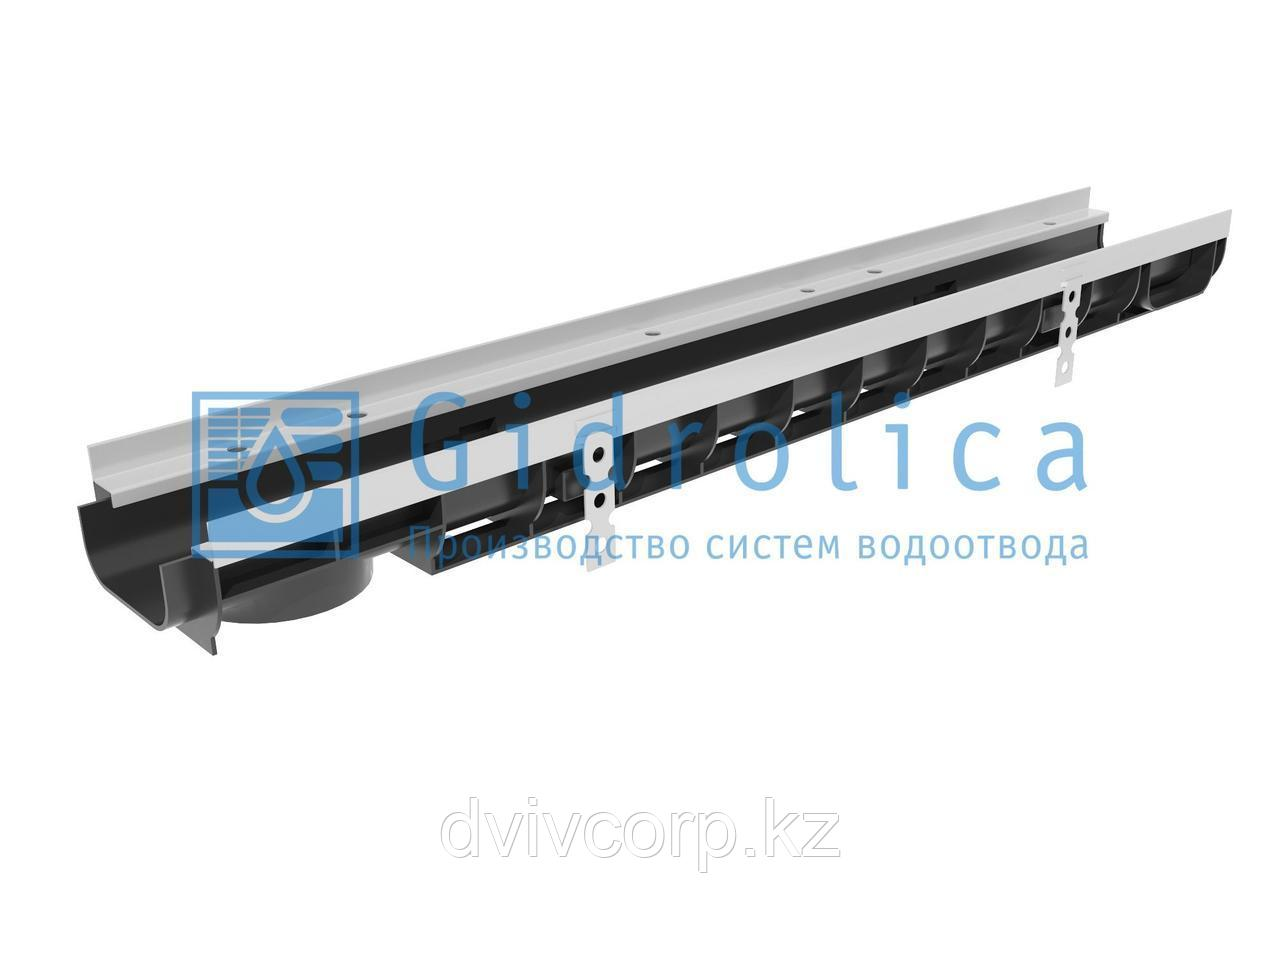 Арт. 0805 Лоток Gidrolica Super, h81,5, DN100, E600